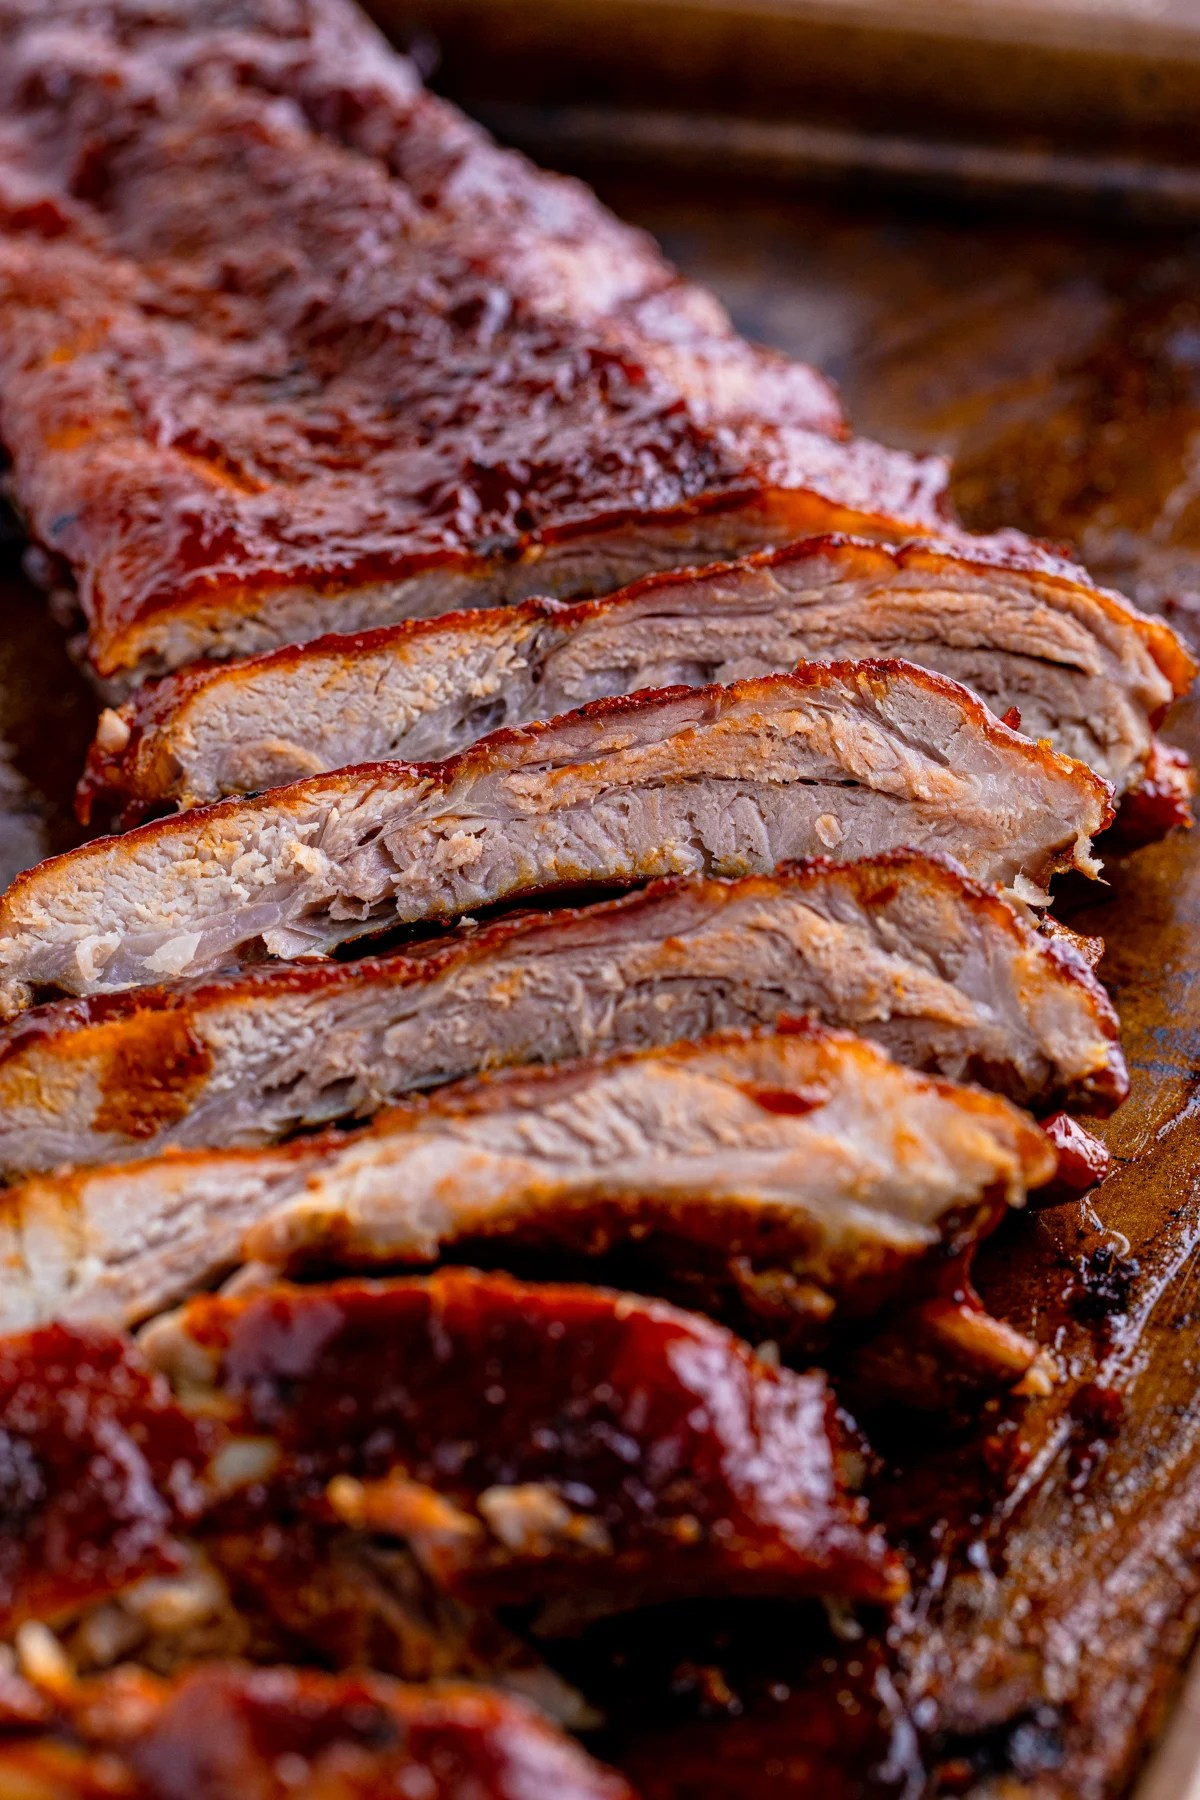 Sliced up ribs